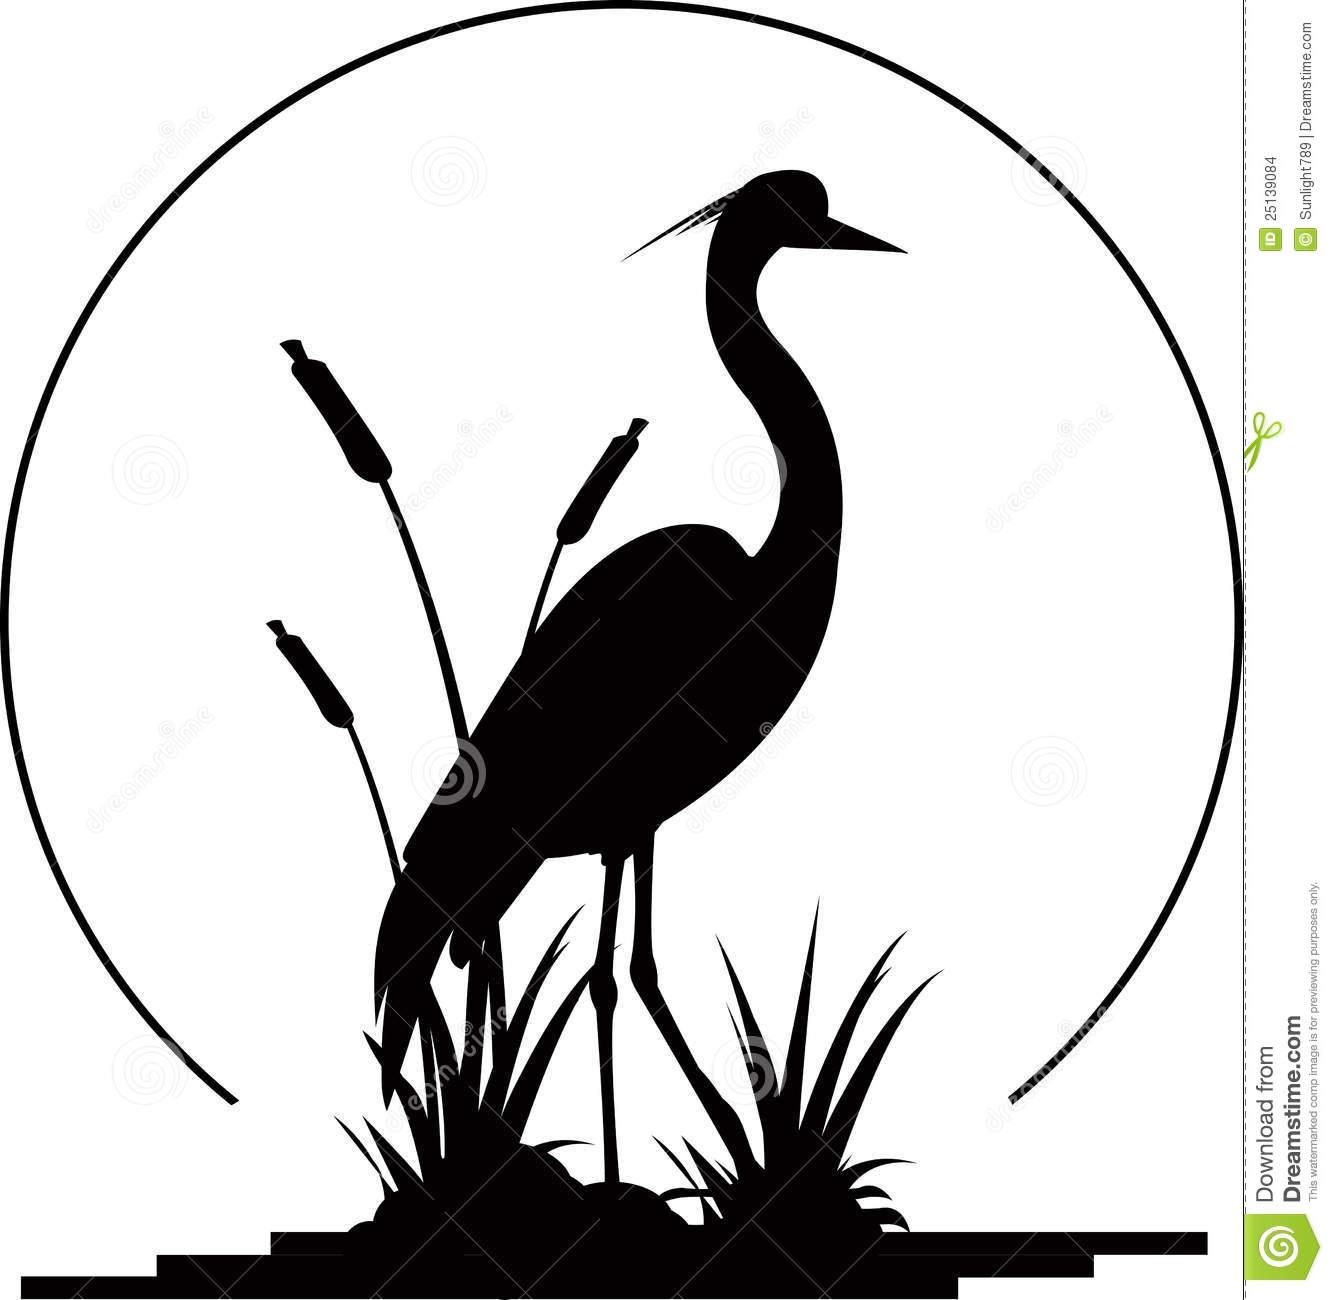 Blue Heron clipart #11